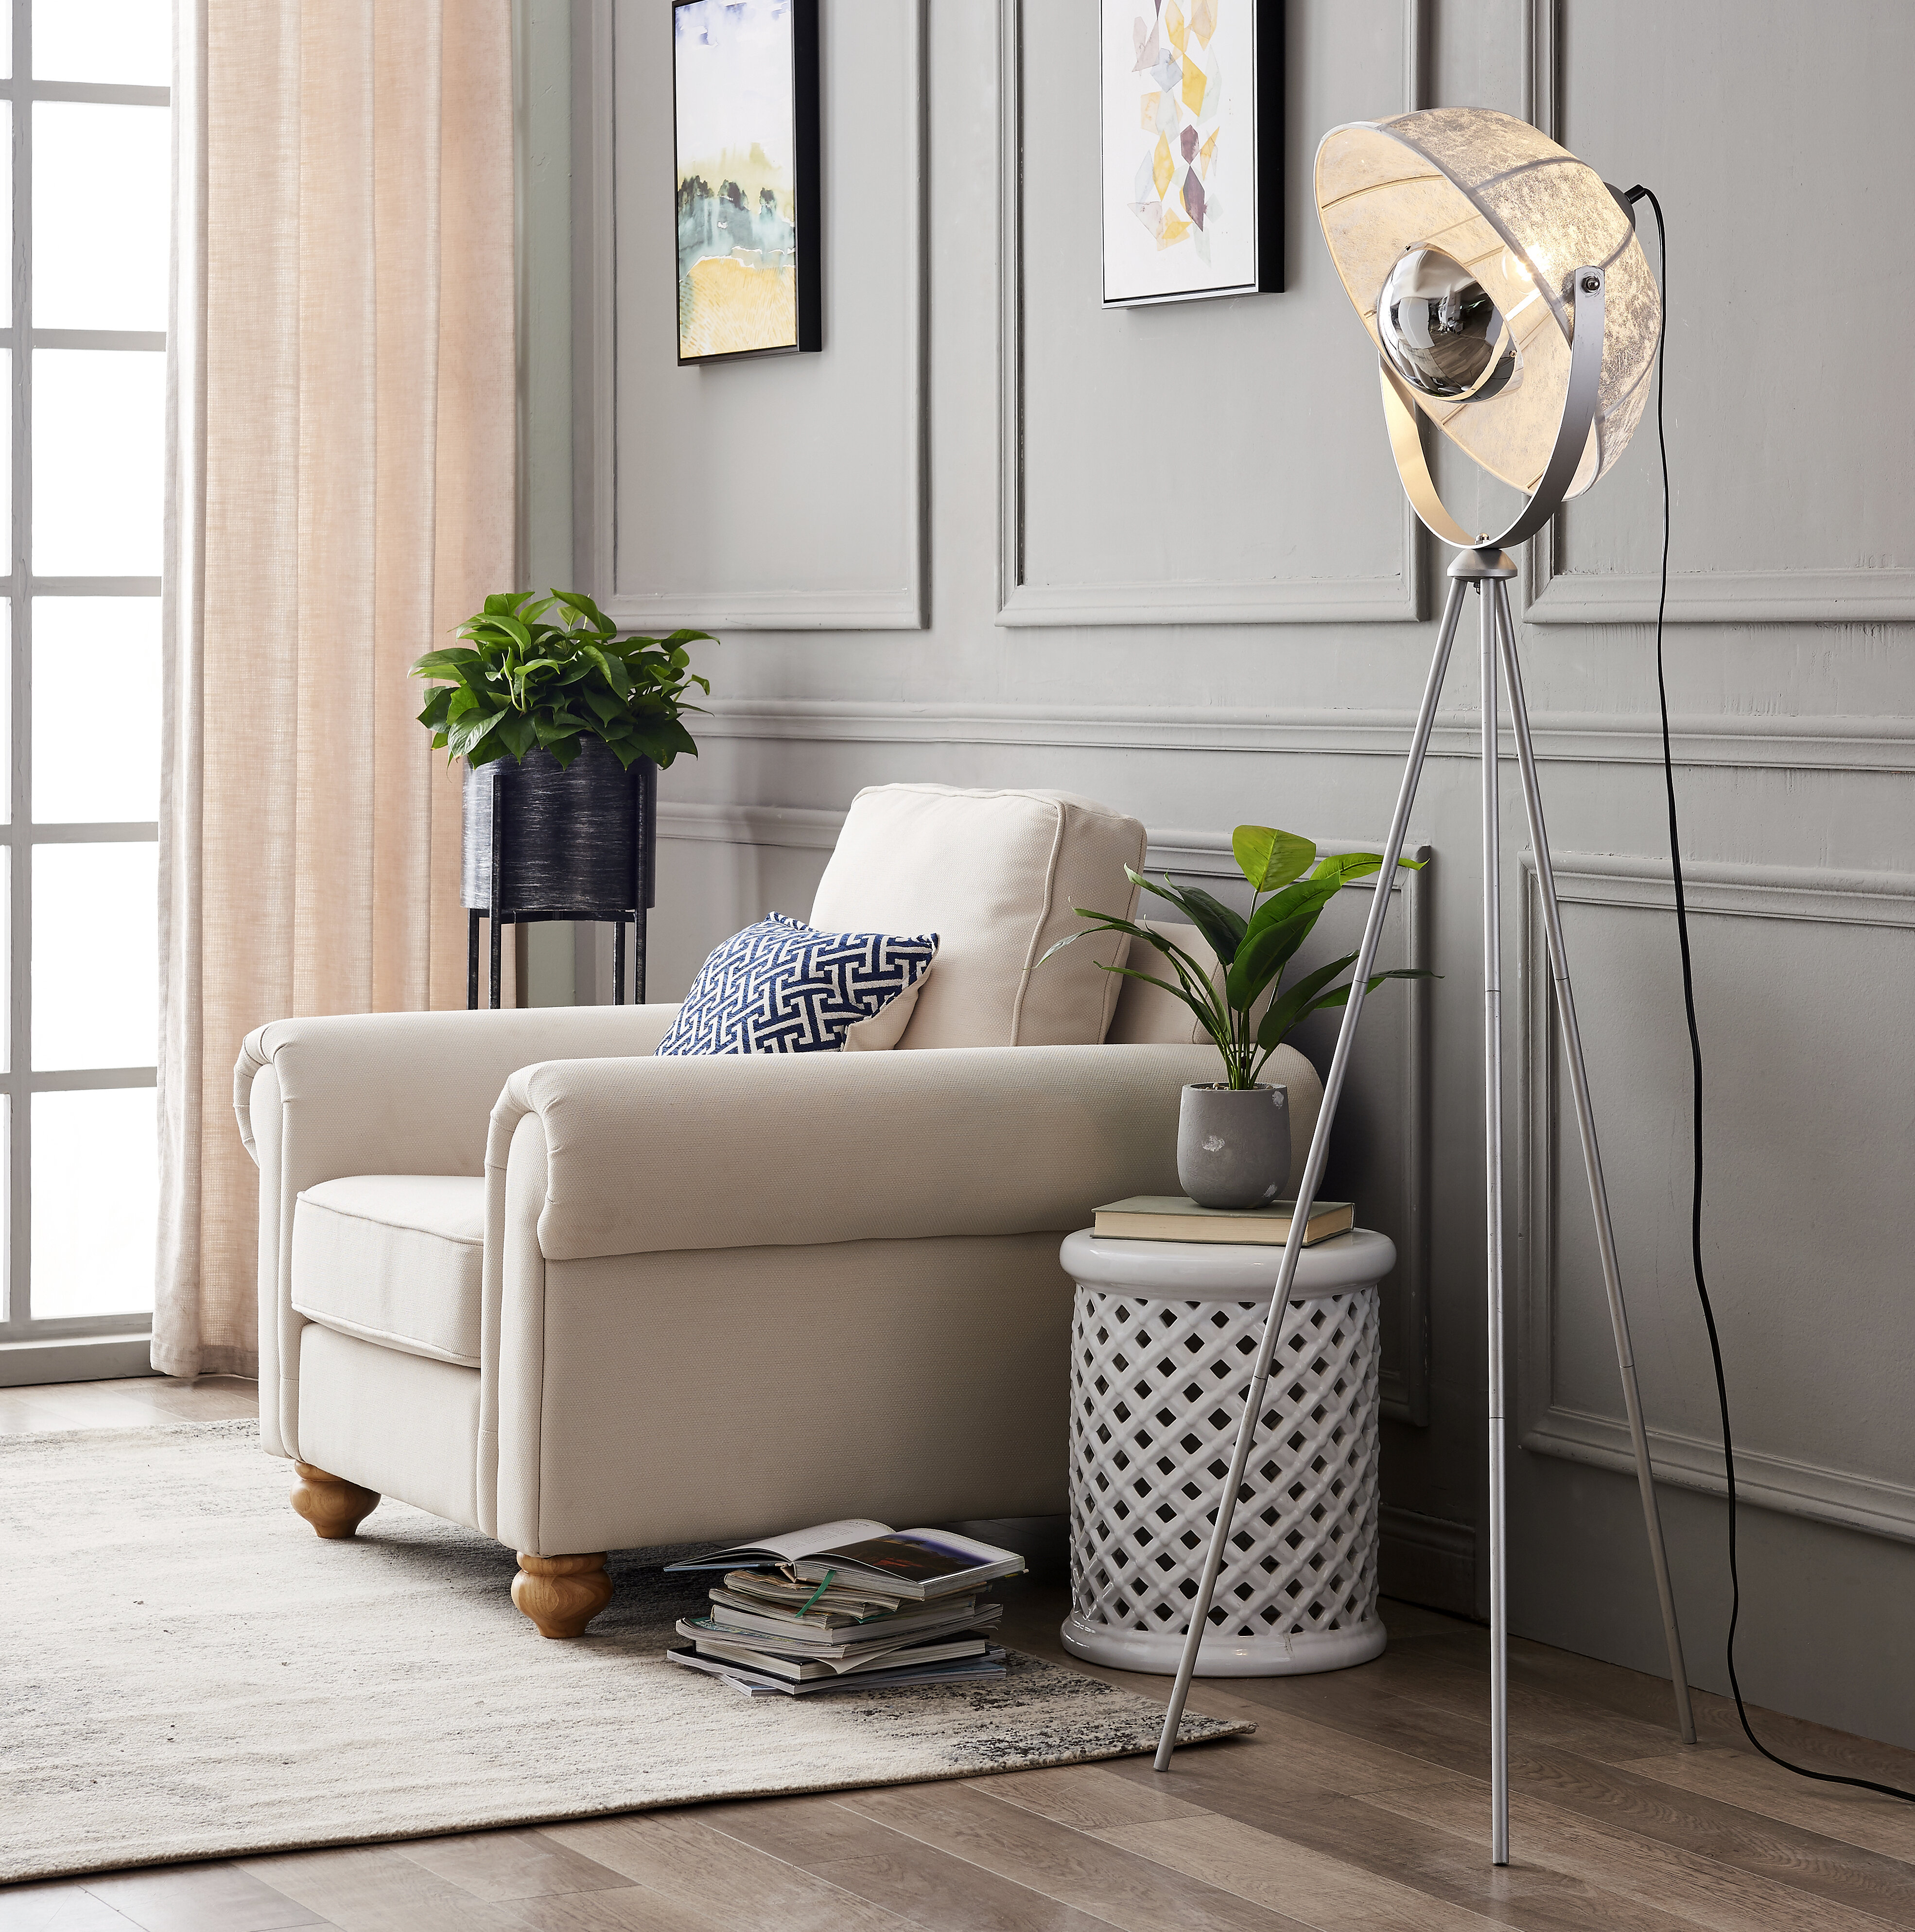 Williston Forge Brockington Spoon 63 Tripod Floor Lamp Reviews Wayfair